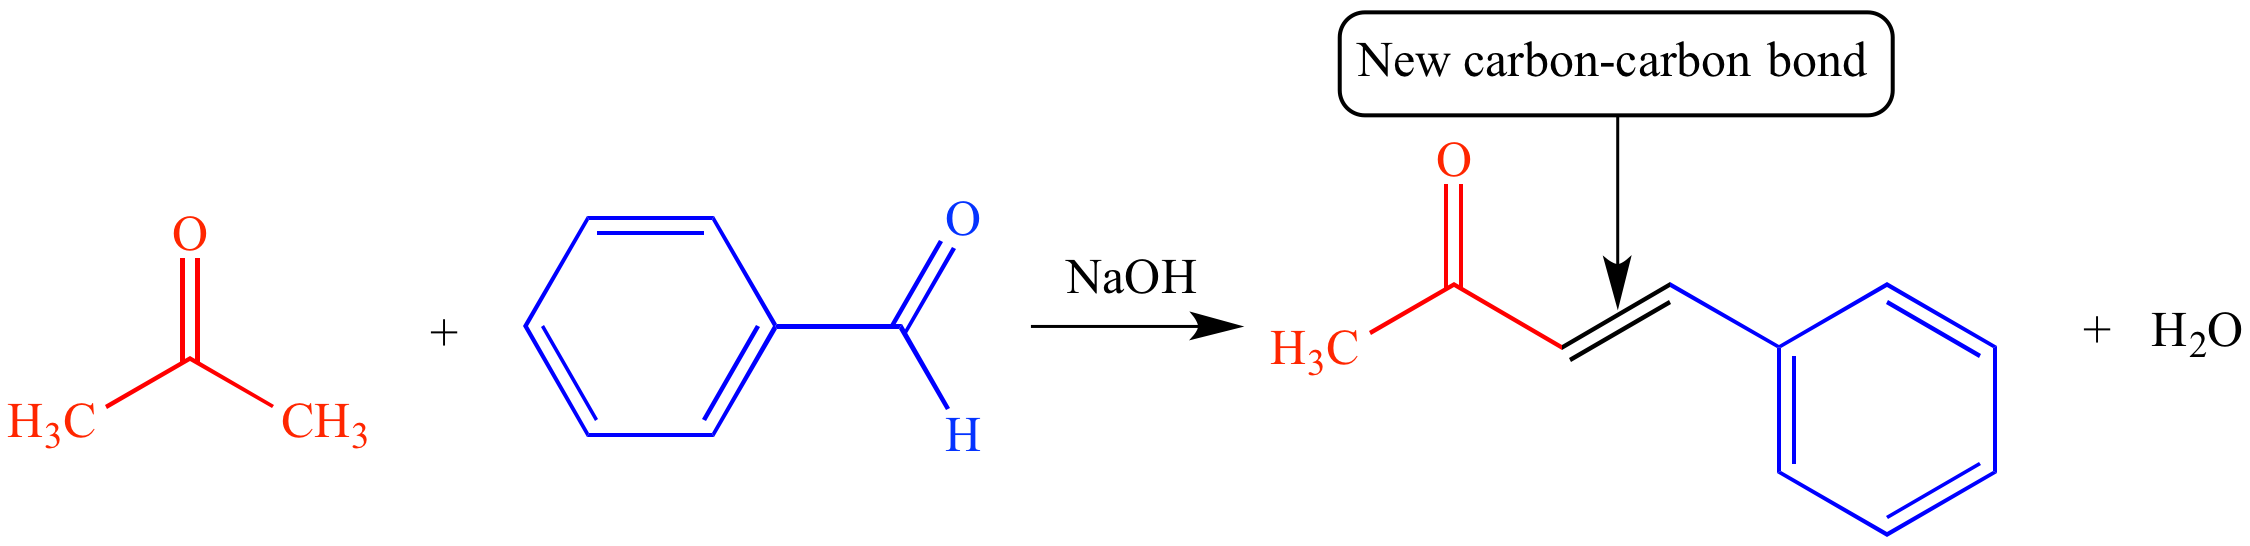 all organic chemistry reactions pdf